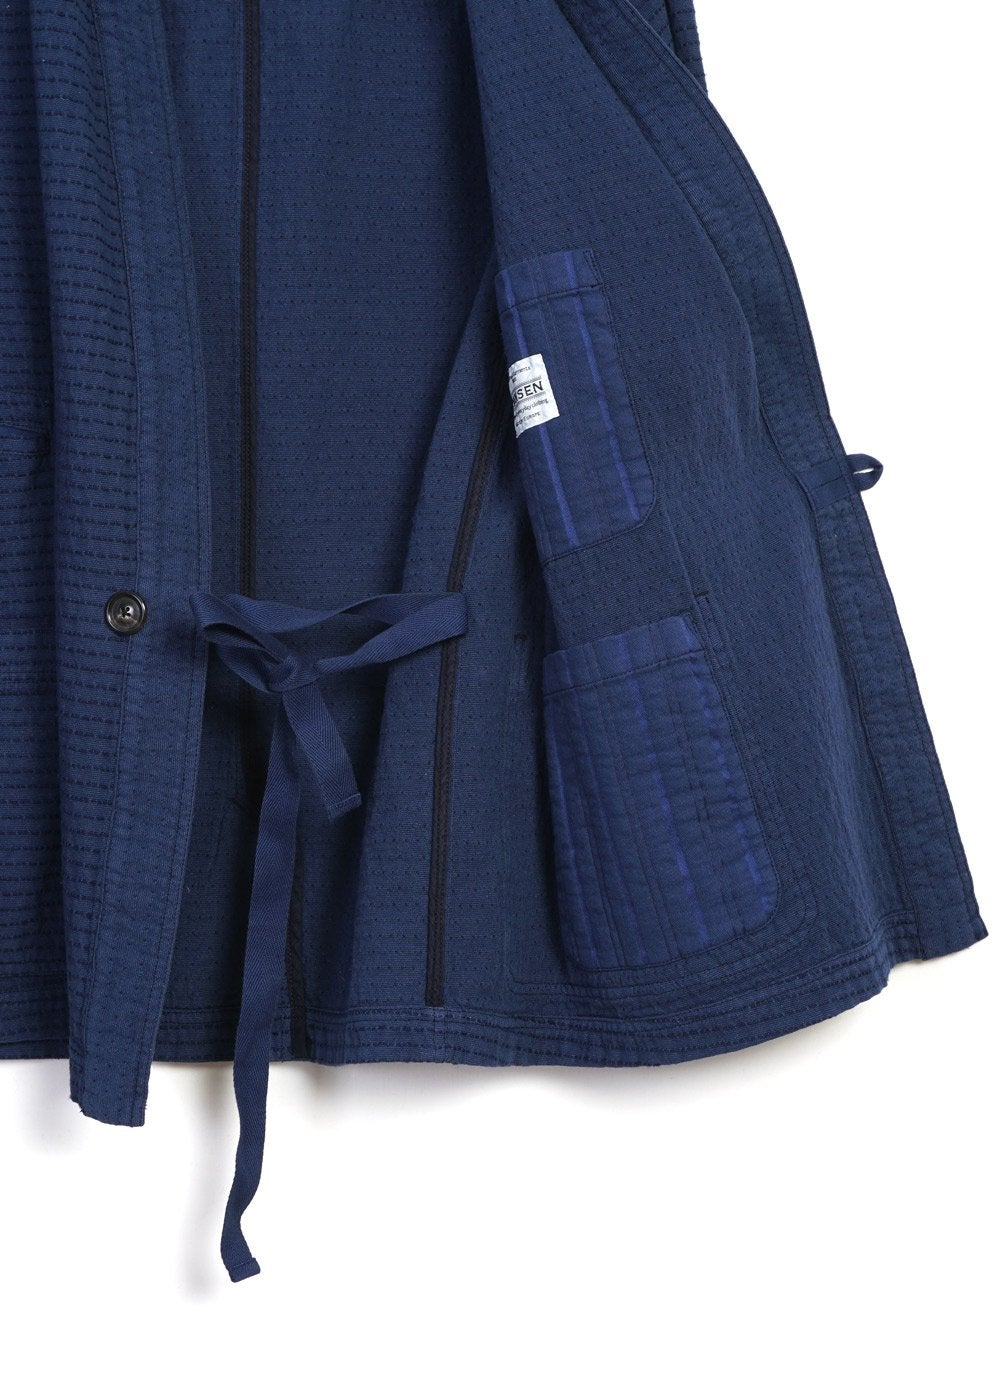 Hansen Garments FOLKE | Scarecrow's Jacket | Blue